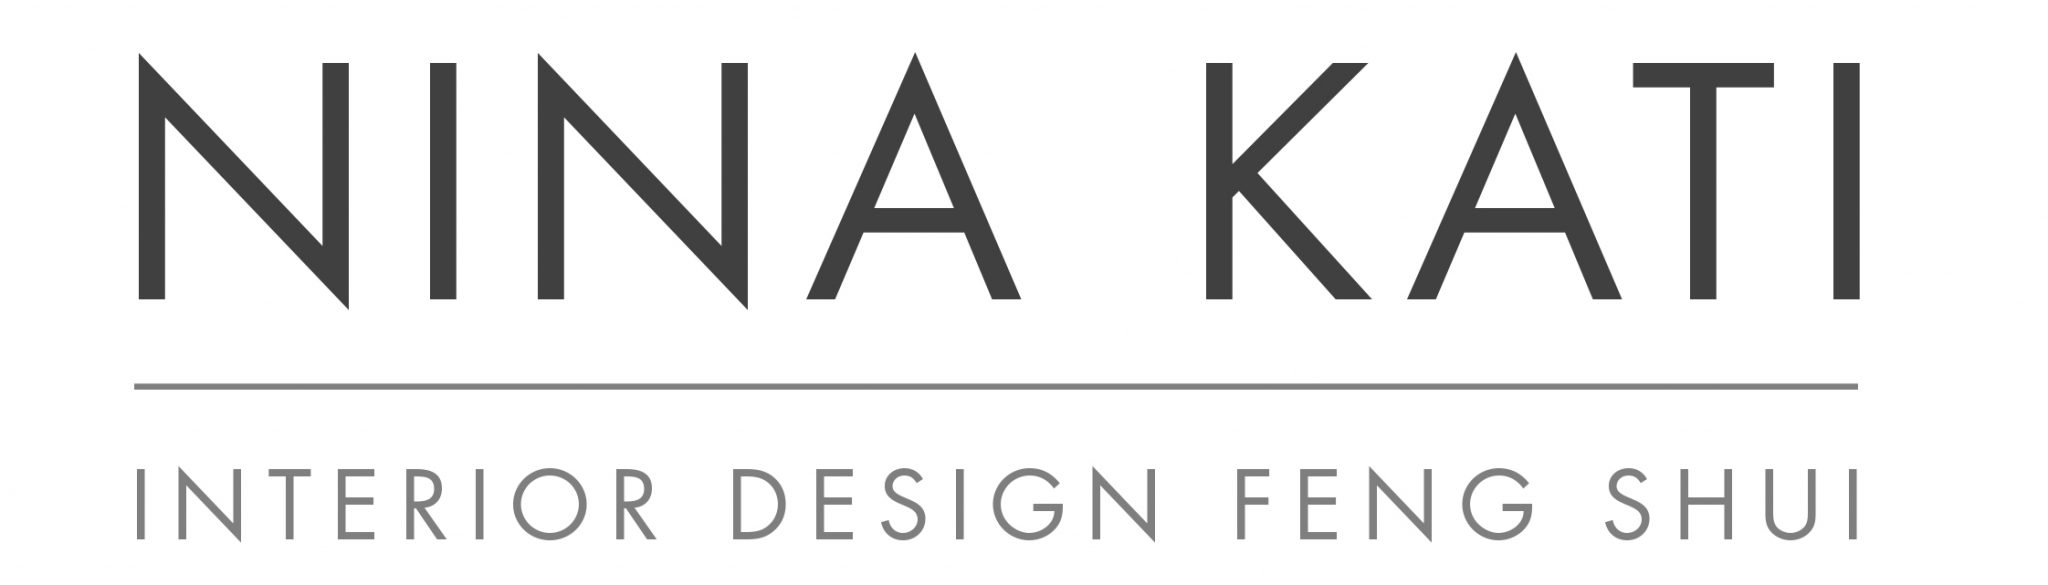 nina kati logo